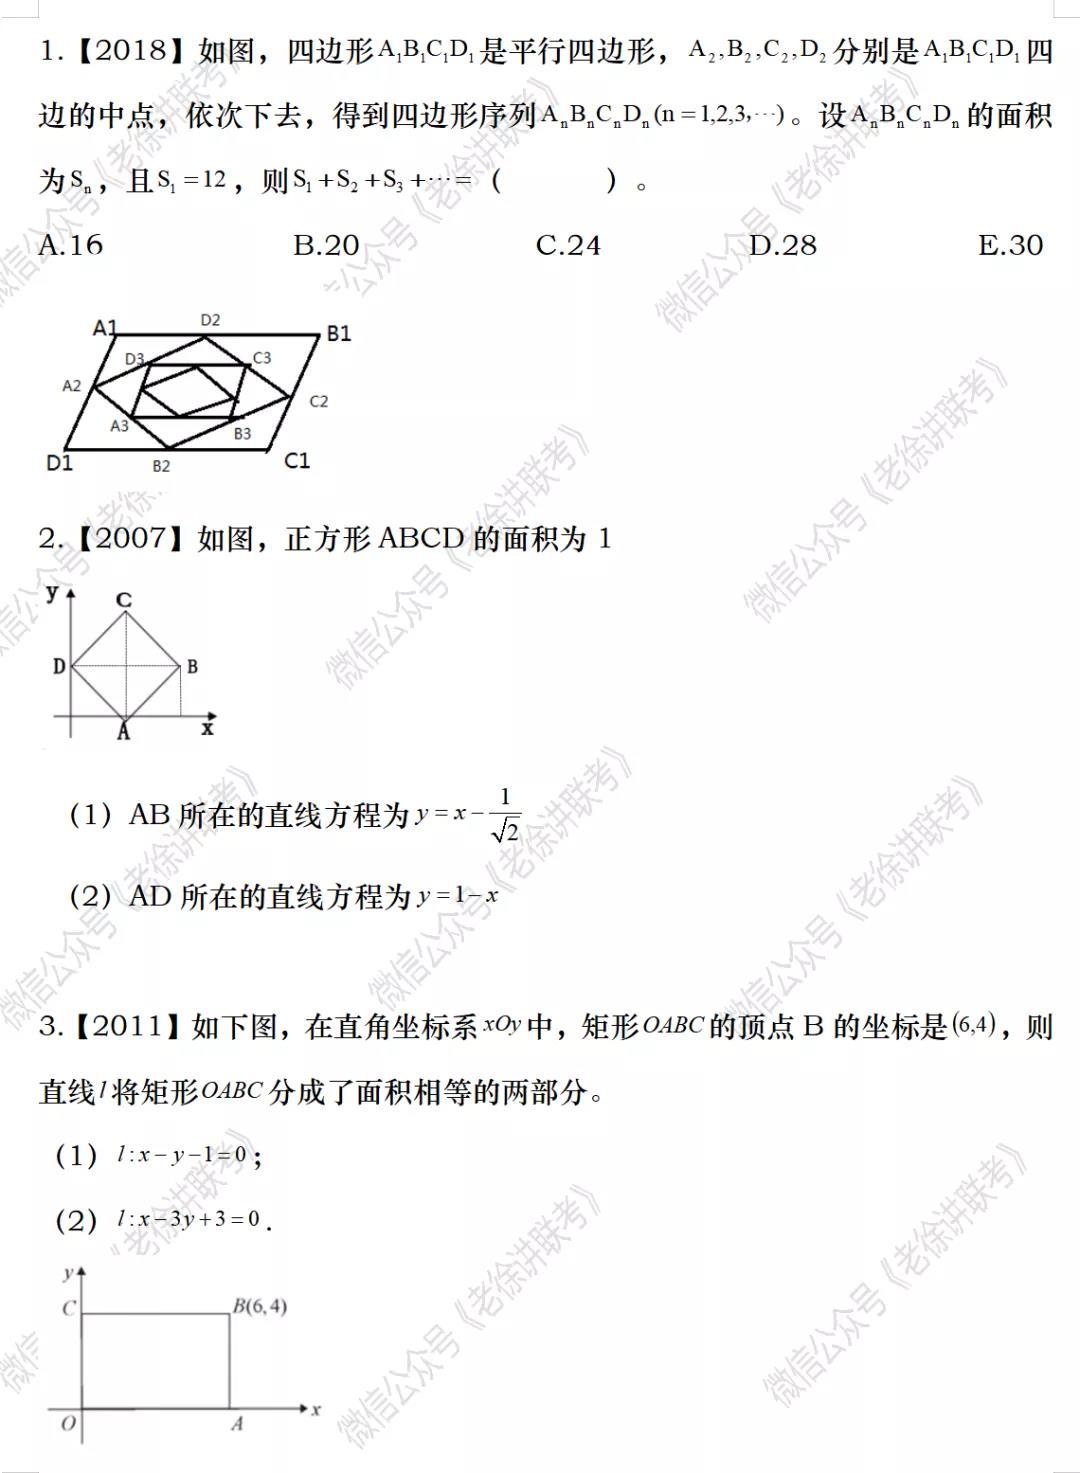 2022MBA考研|管理类联考:数学专题训练--四边形或多边形的面积(第五期)